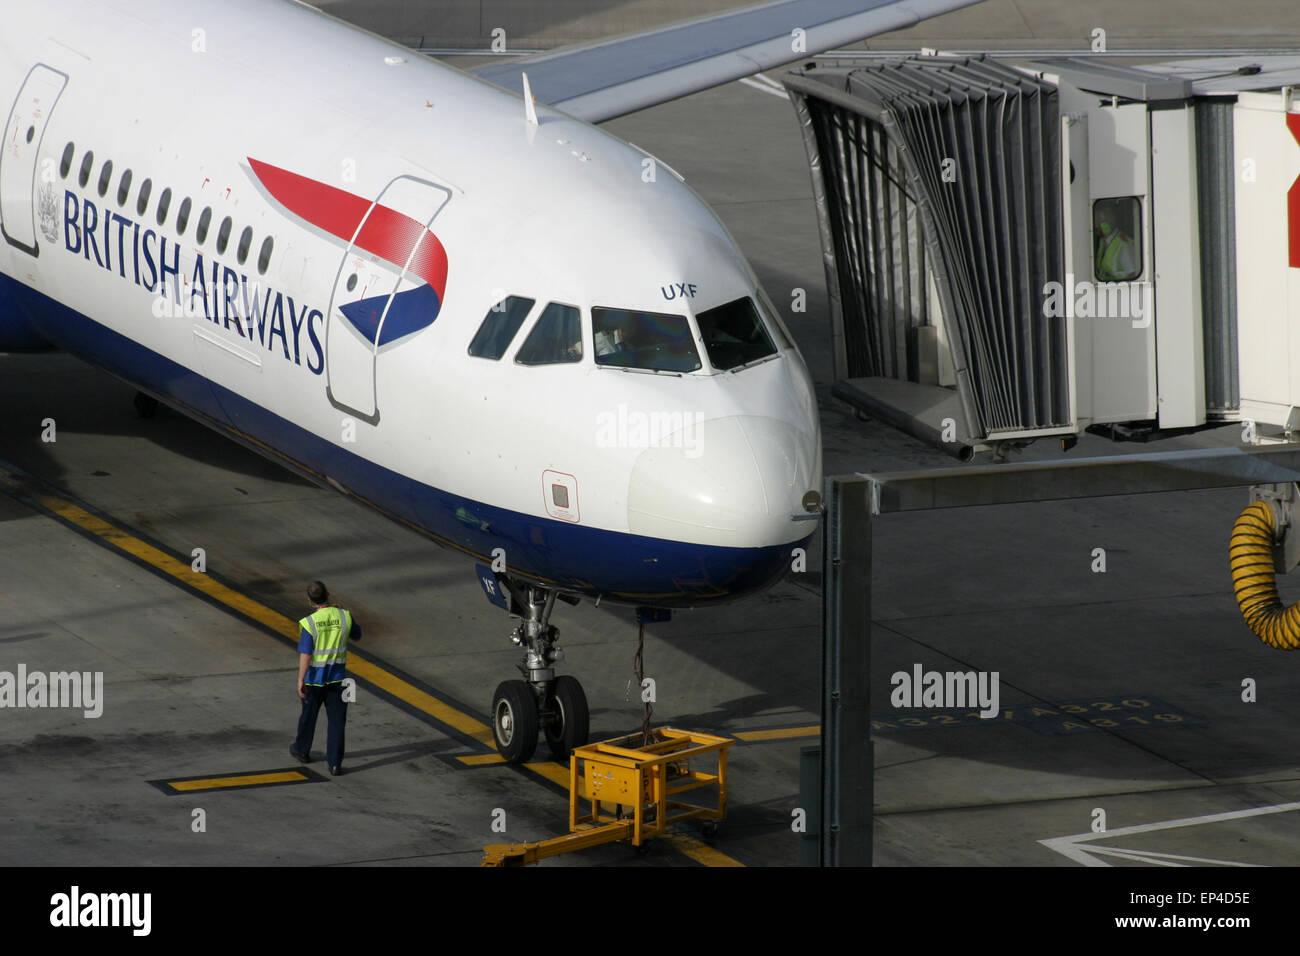 BRITISH AIRWAYS TERMINAL 5 HEATHROW - Stock Image